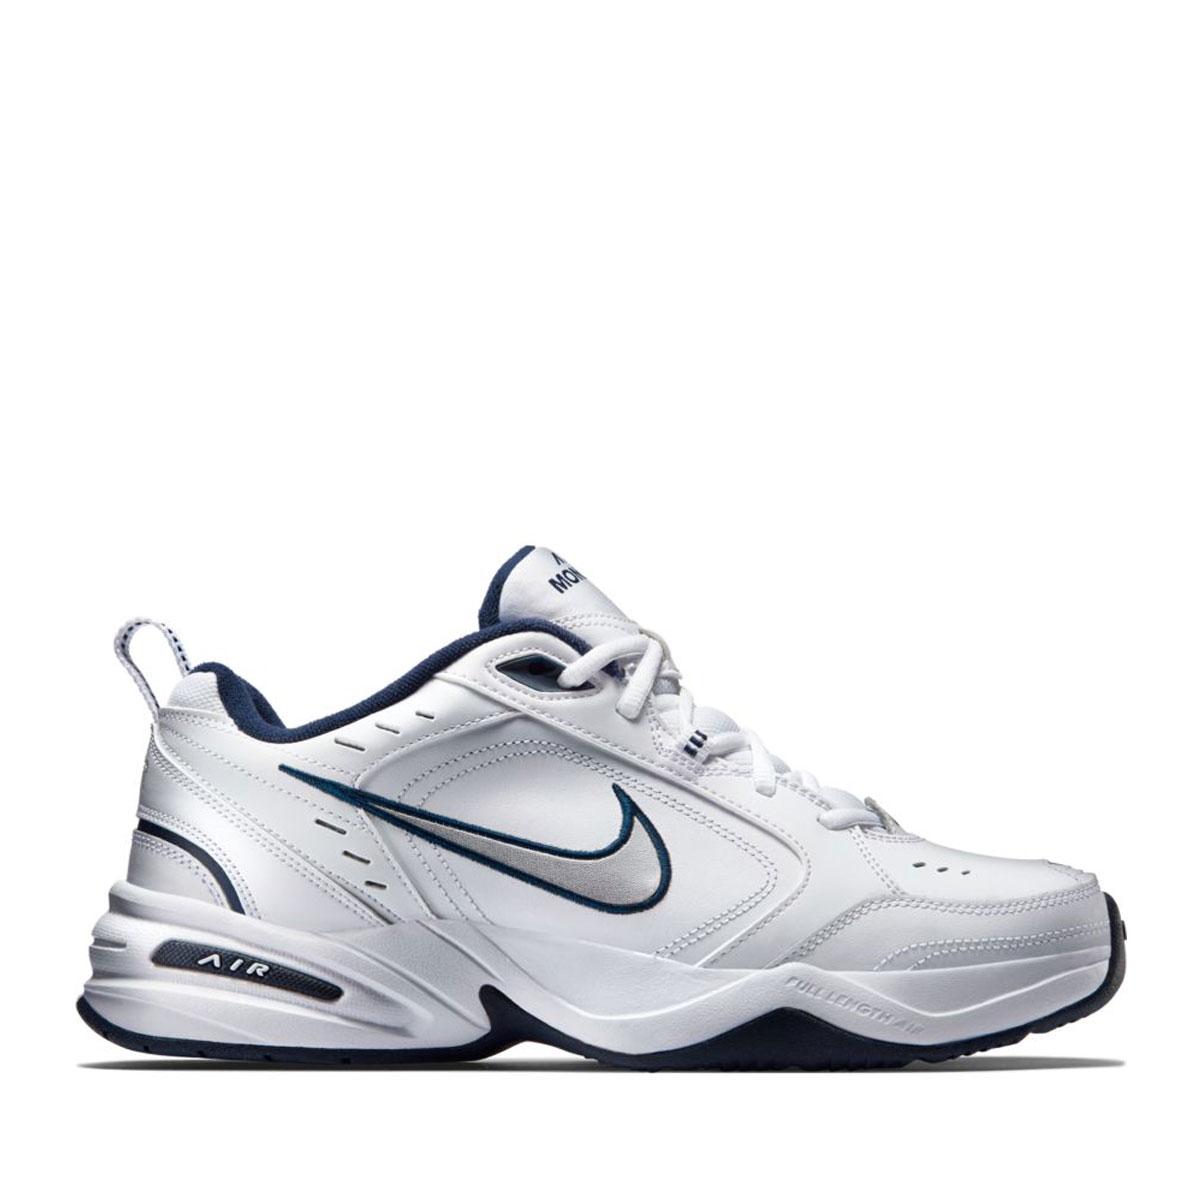 Monarch 445 Shoes 102 Sneakers Men Nike エアモナーク Iv